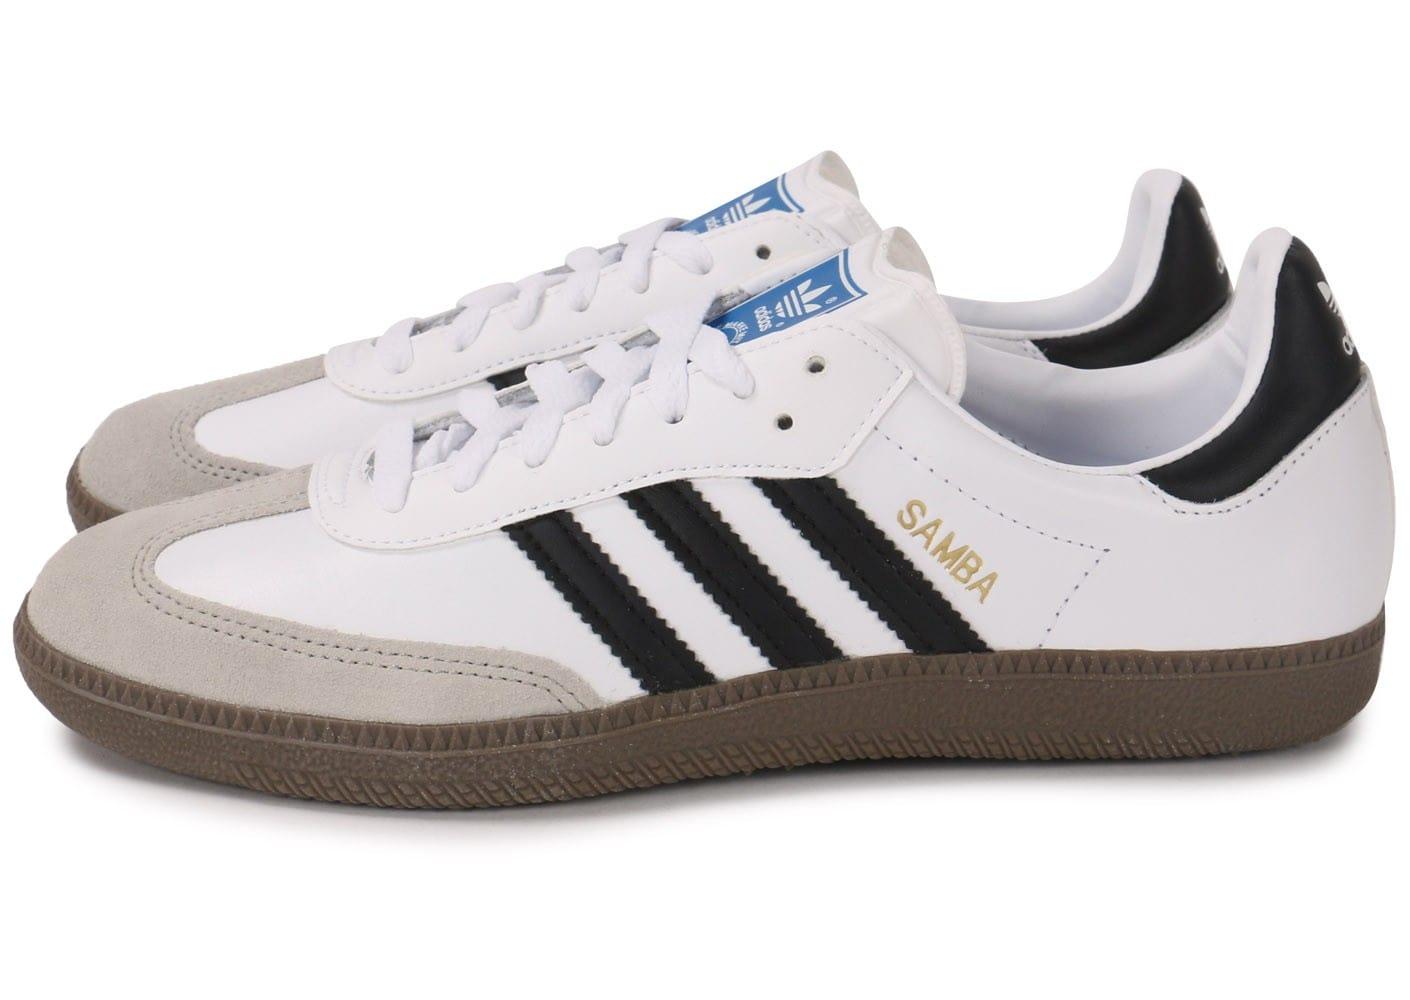 adidas original adidas samba france